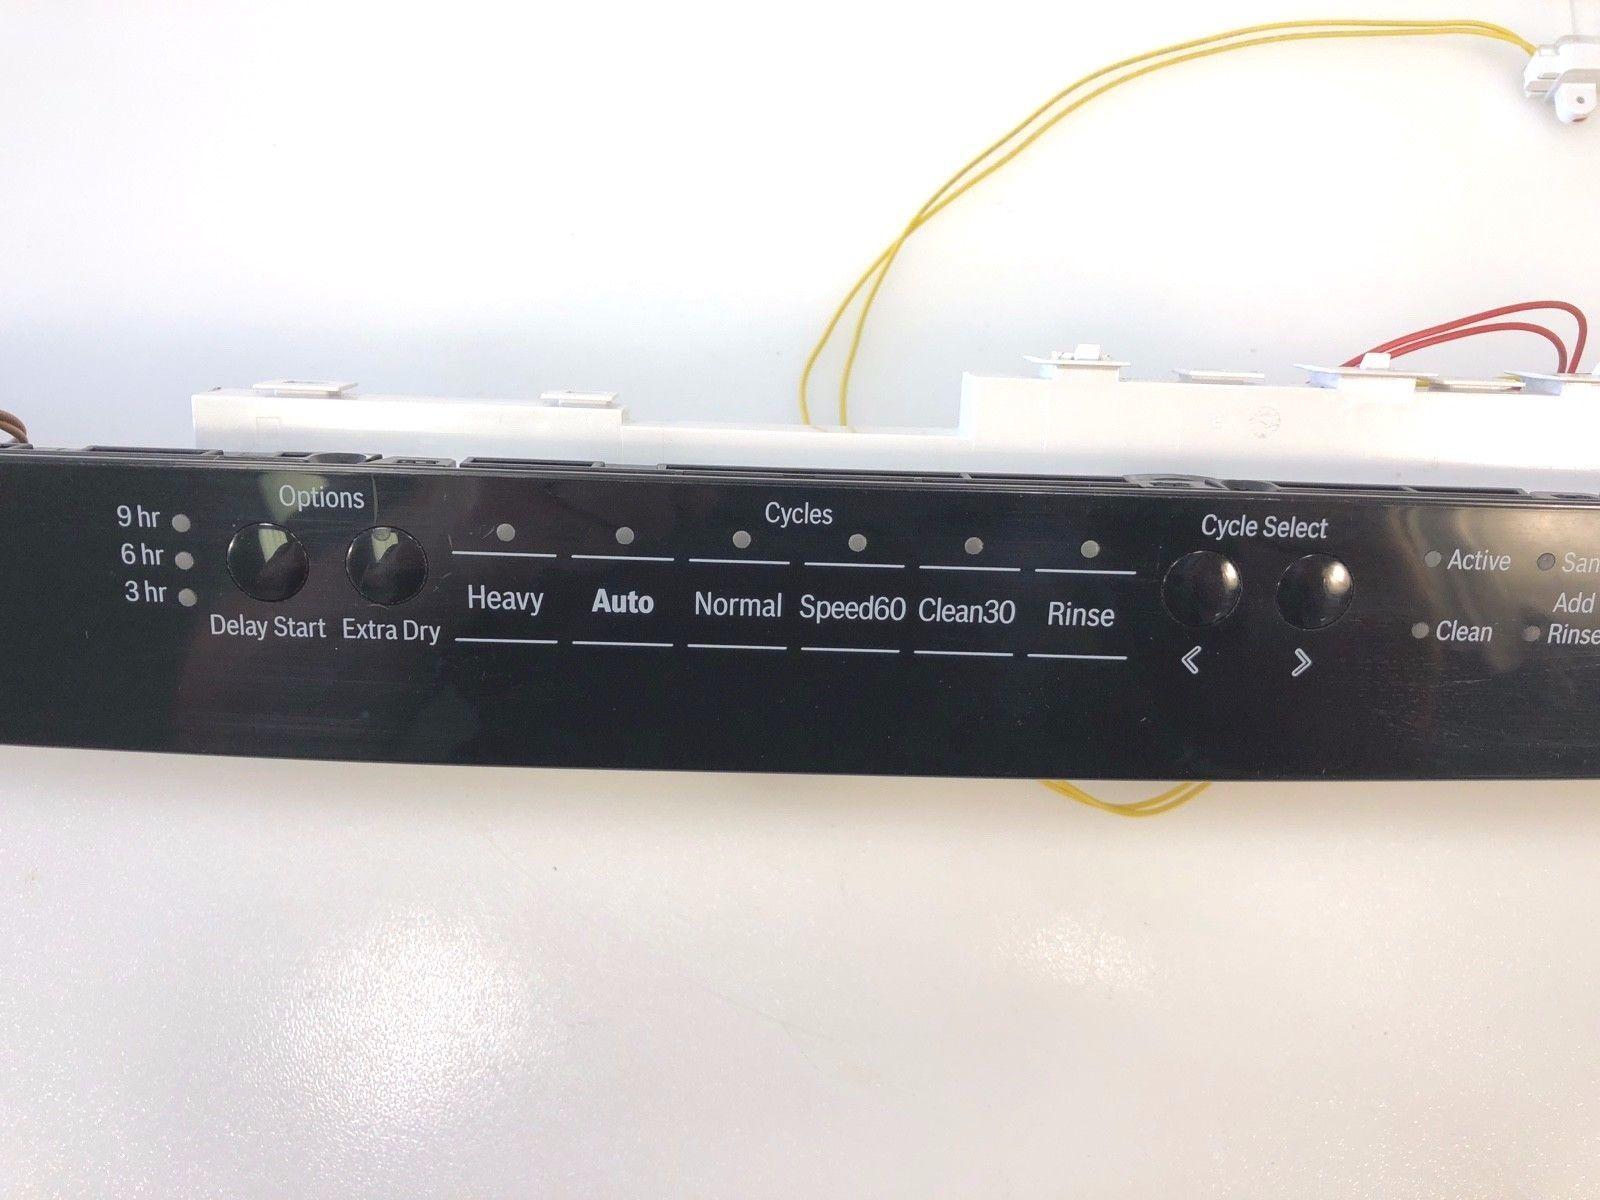 hight resolution of bosch dishwasher control panel w board 9001099416